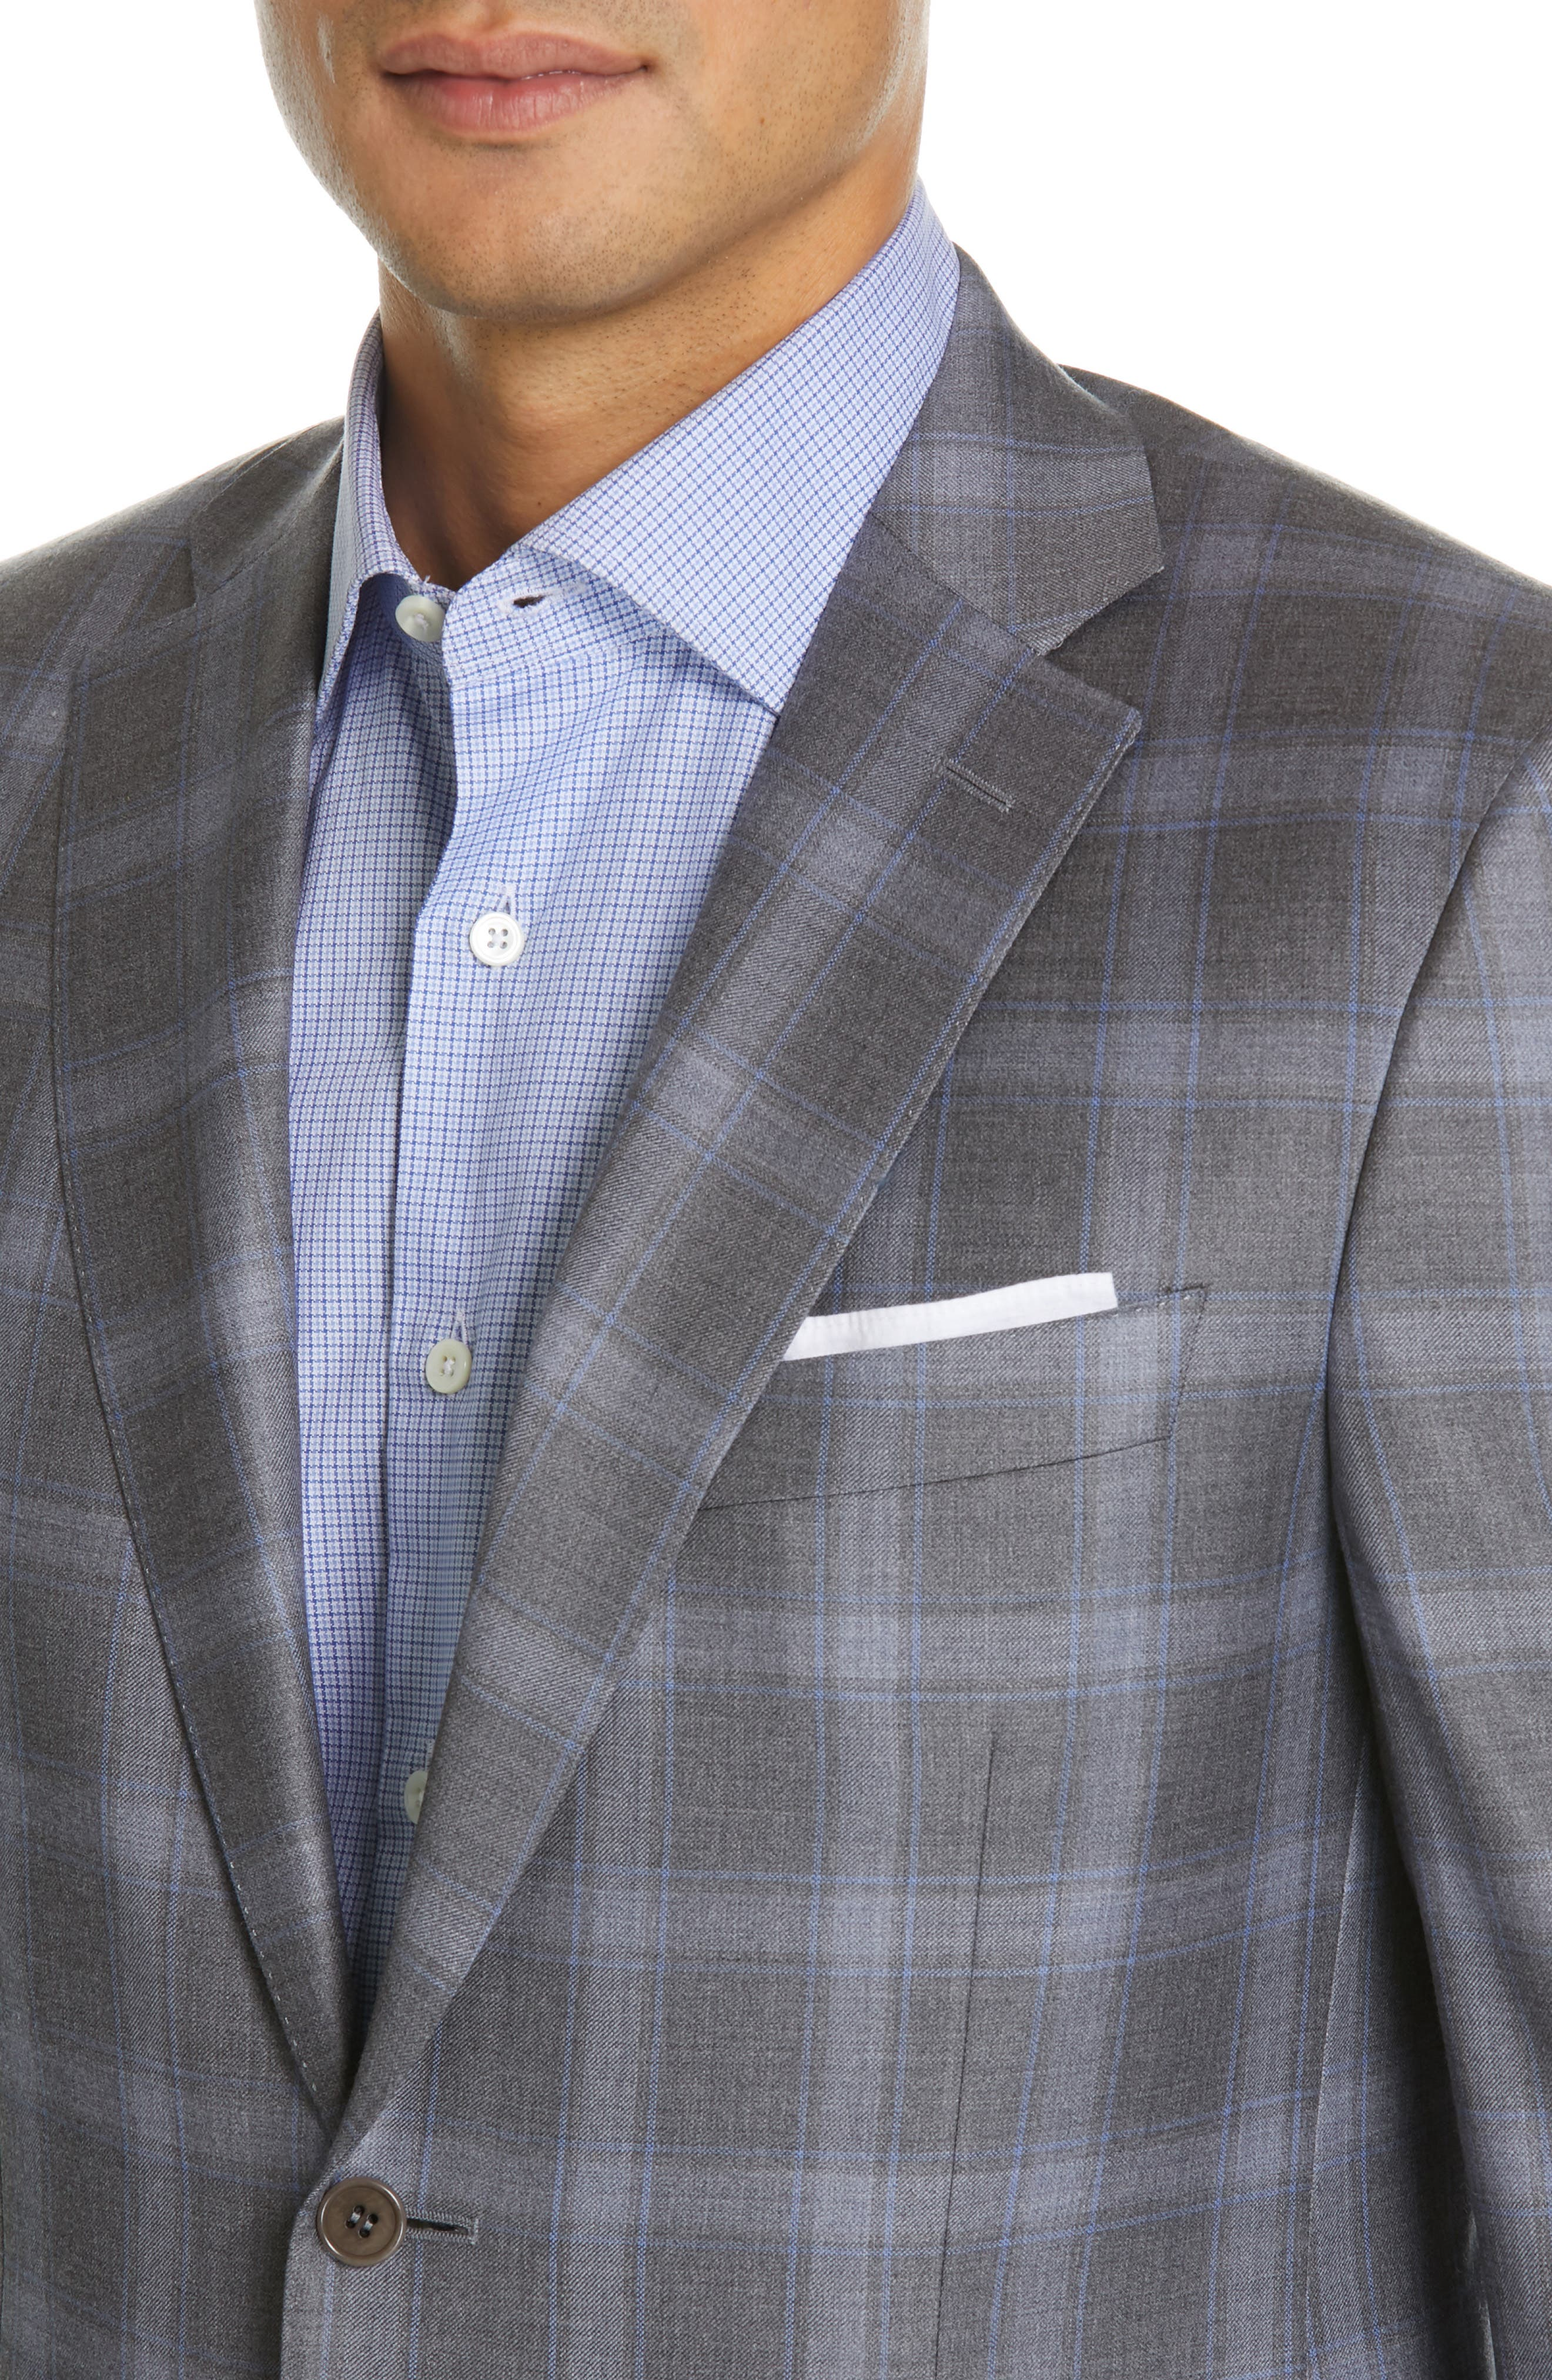 Sienna Classic Fit Plaid Wool Sport Coat,                             Alternate thumbnail 4, color,                             GREY